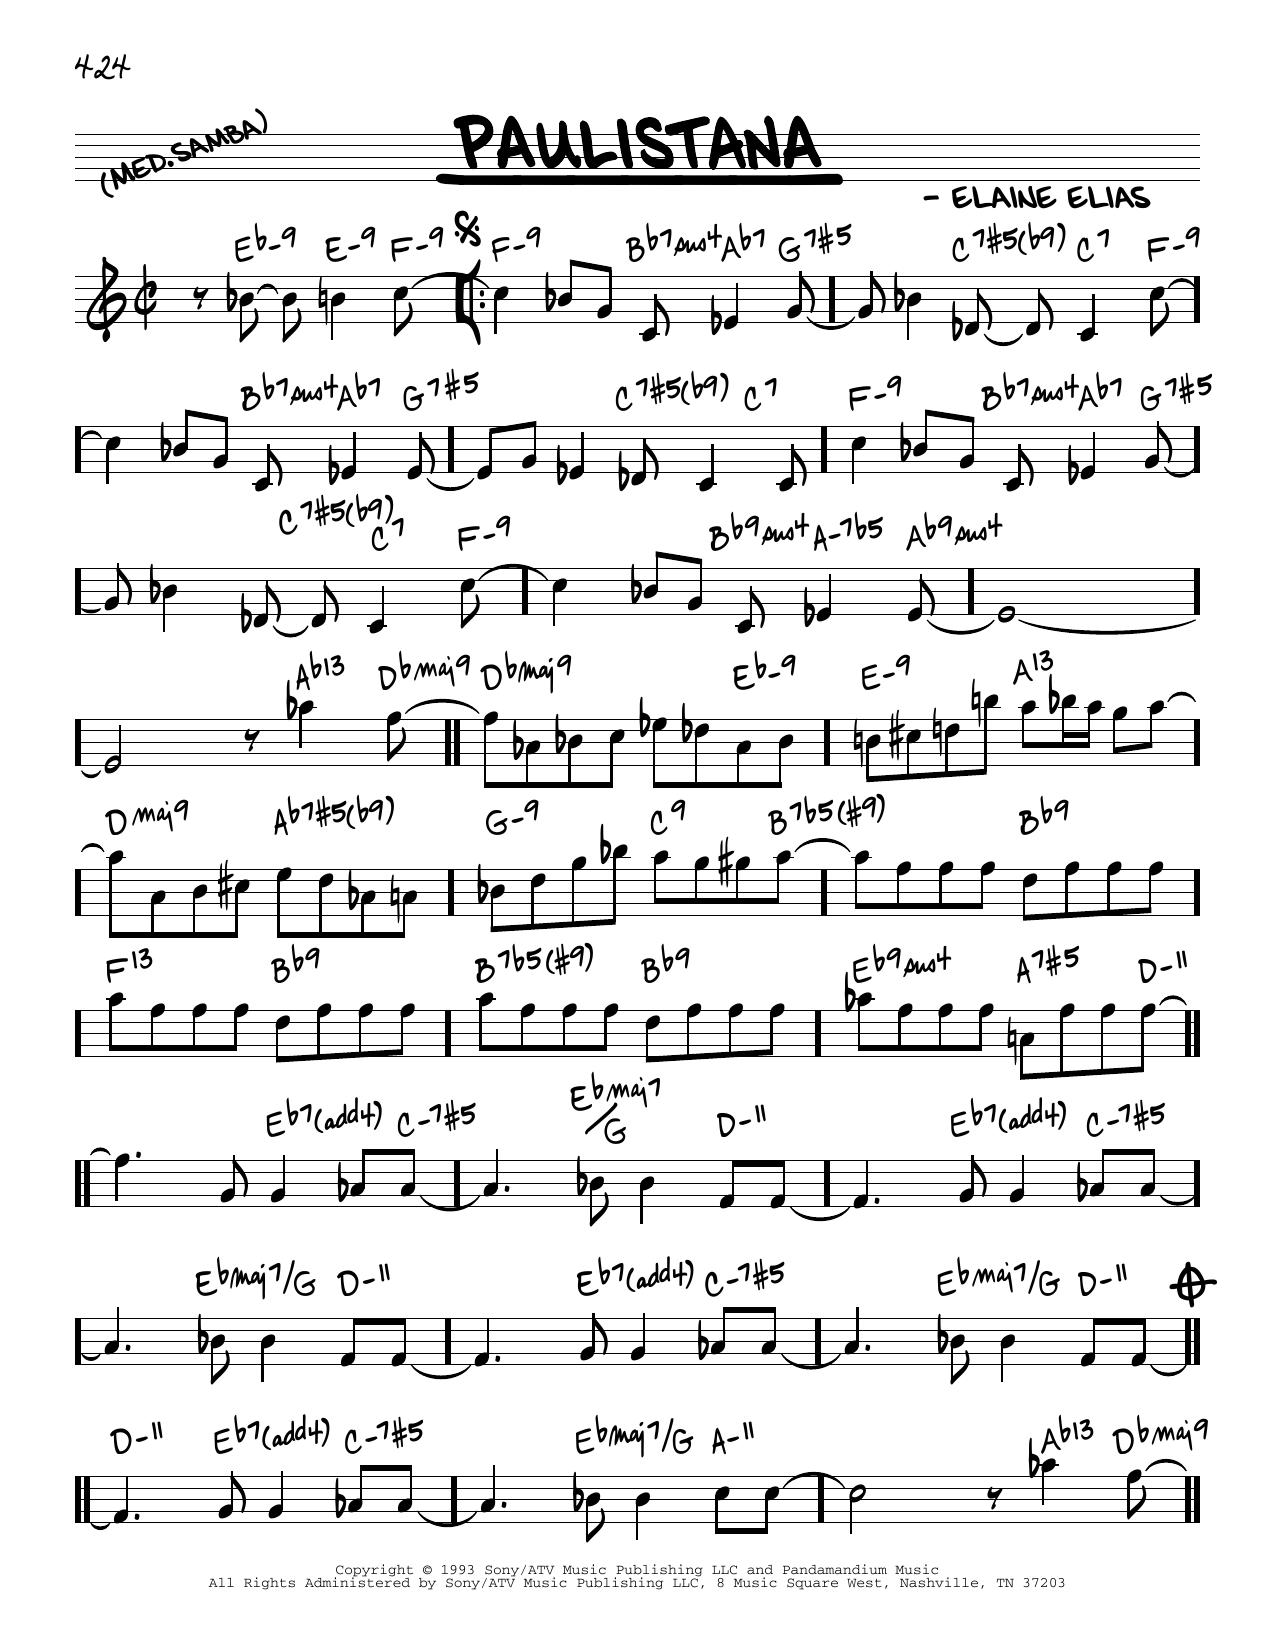 Elaine Elias Paulistana sheet music notes and chords. Download Printable PDF.